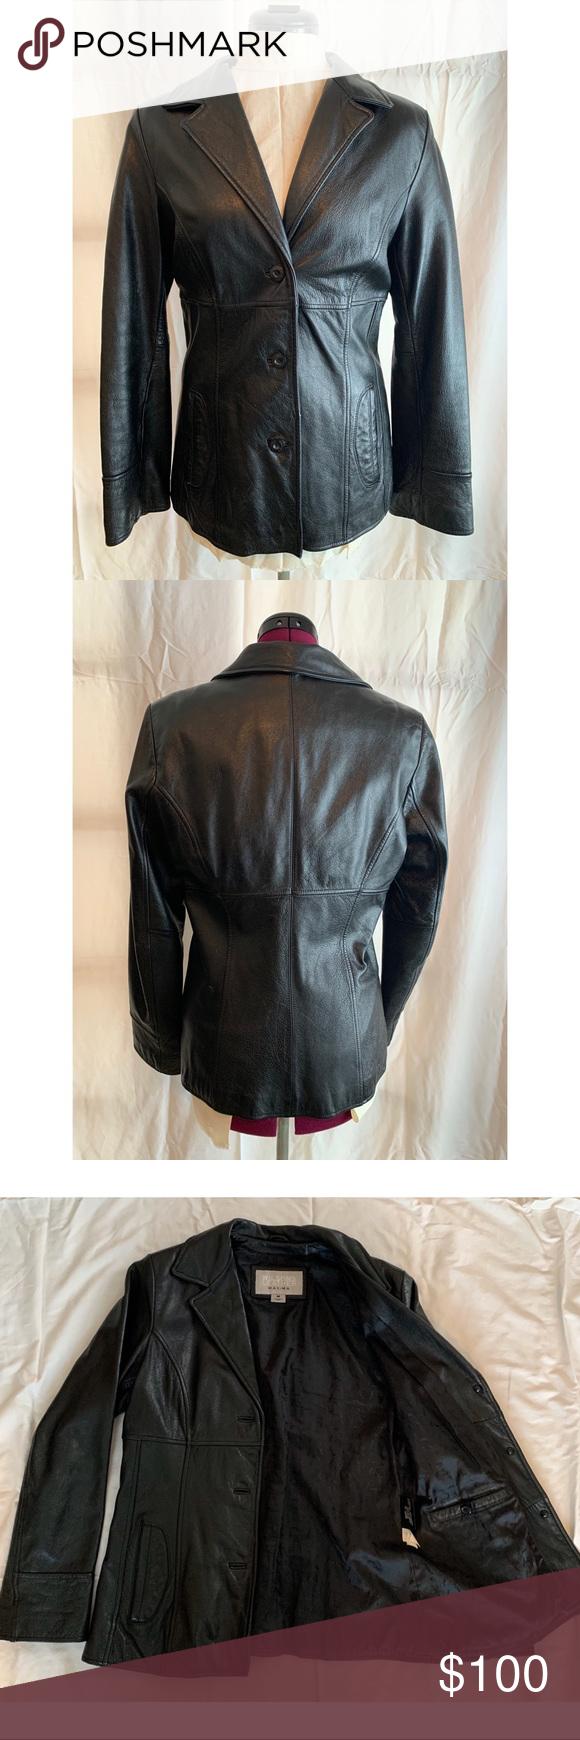 Vintage Wilson's Leather women's jacket Leather jackets